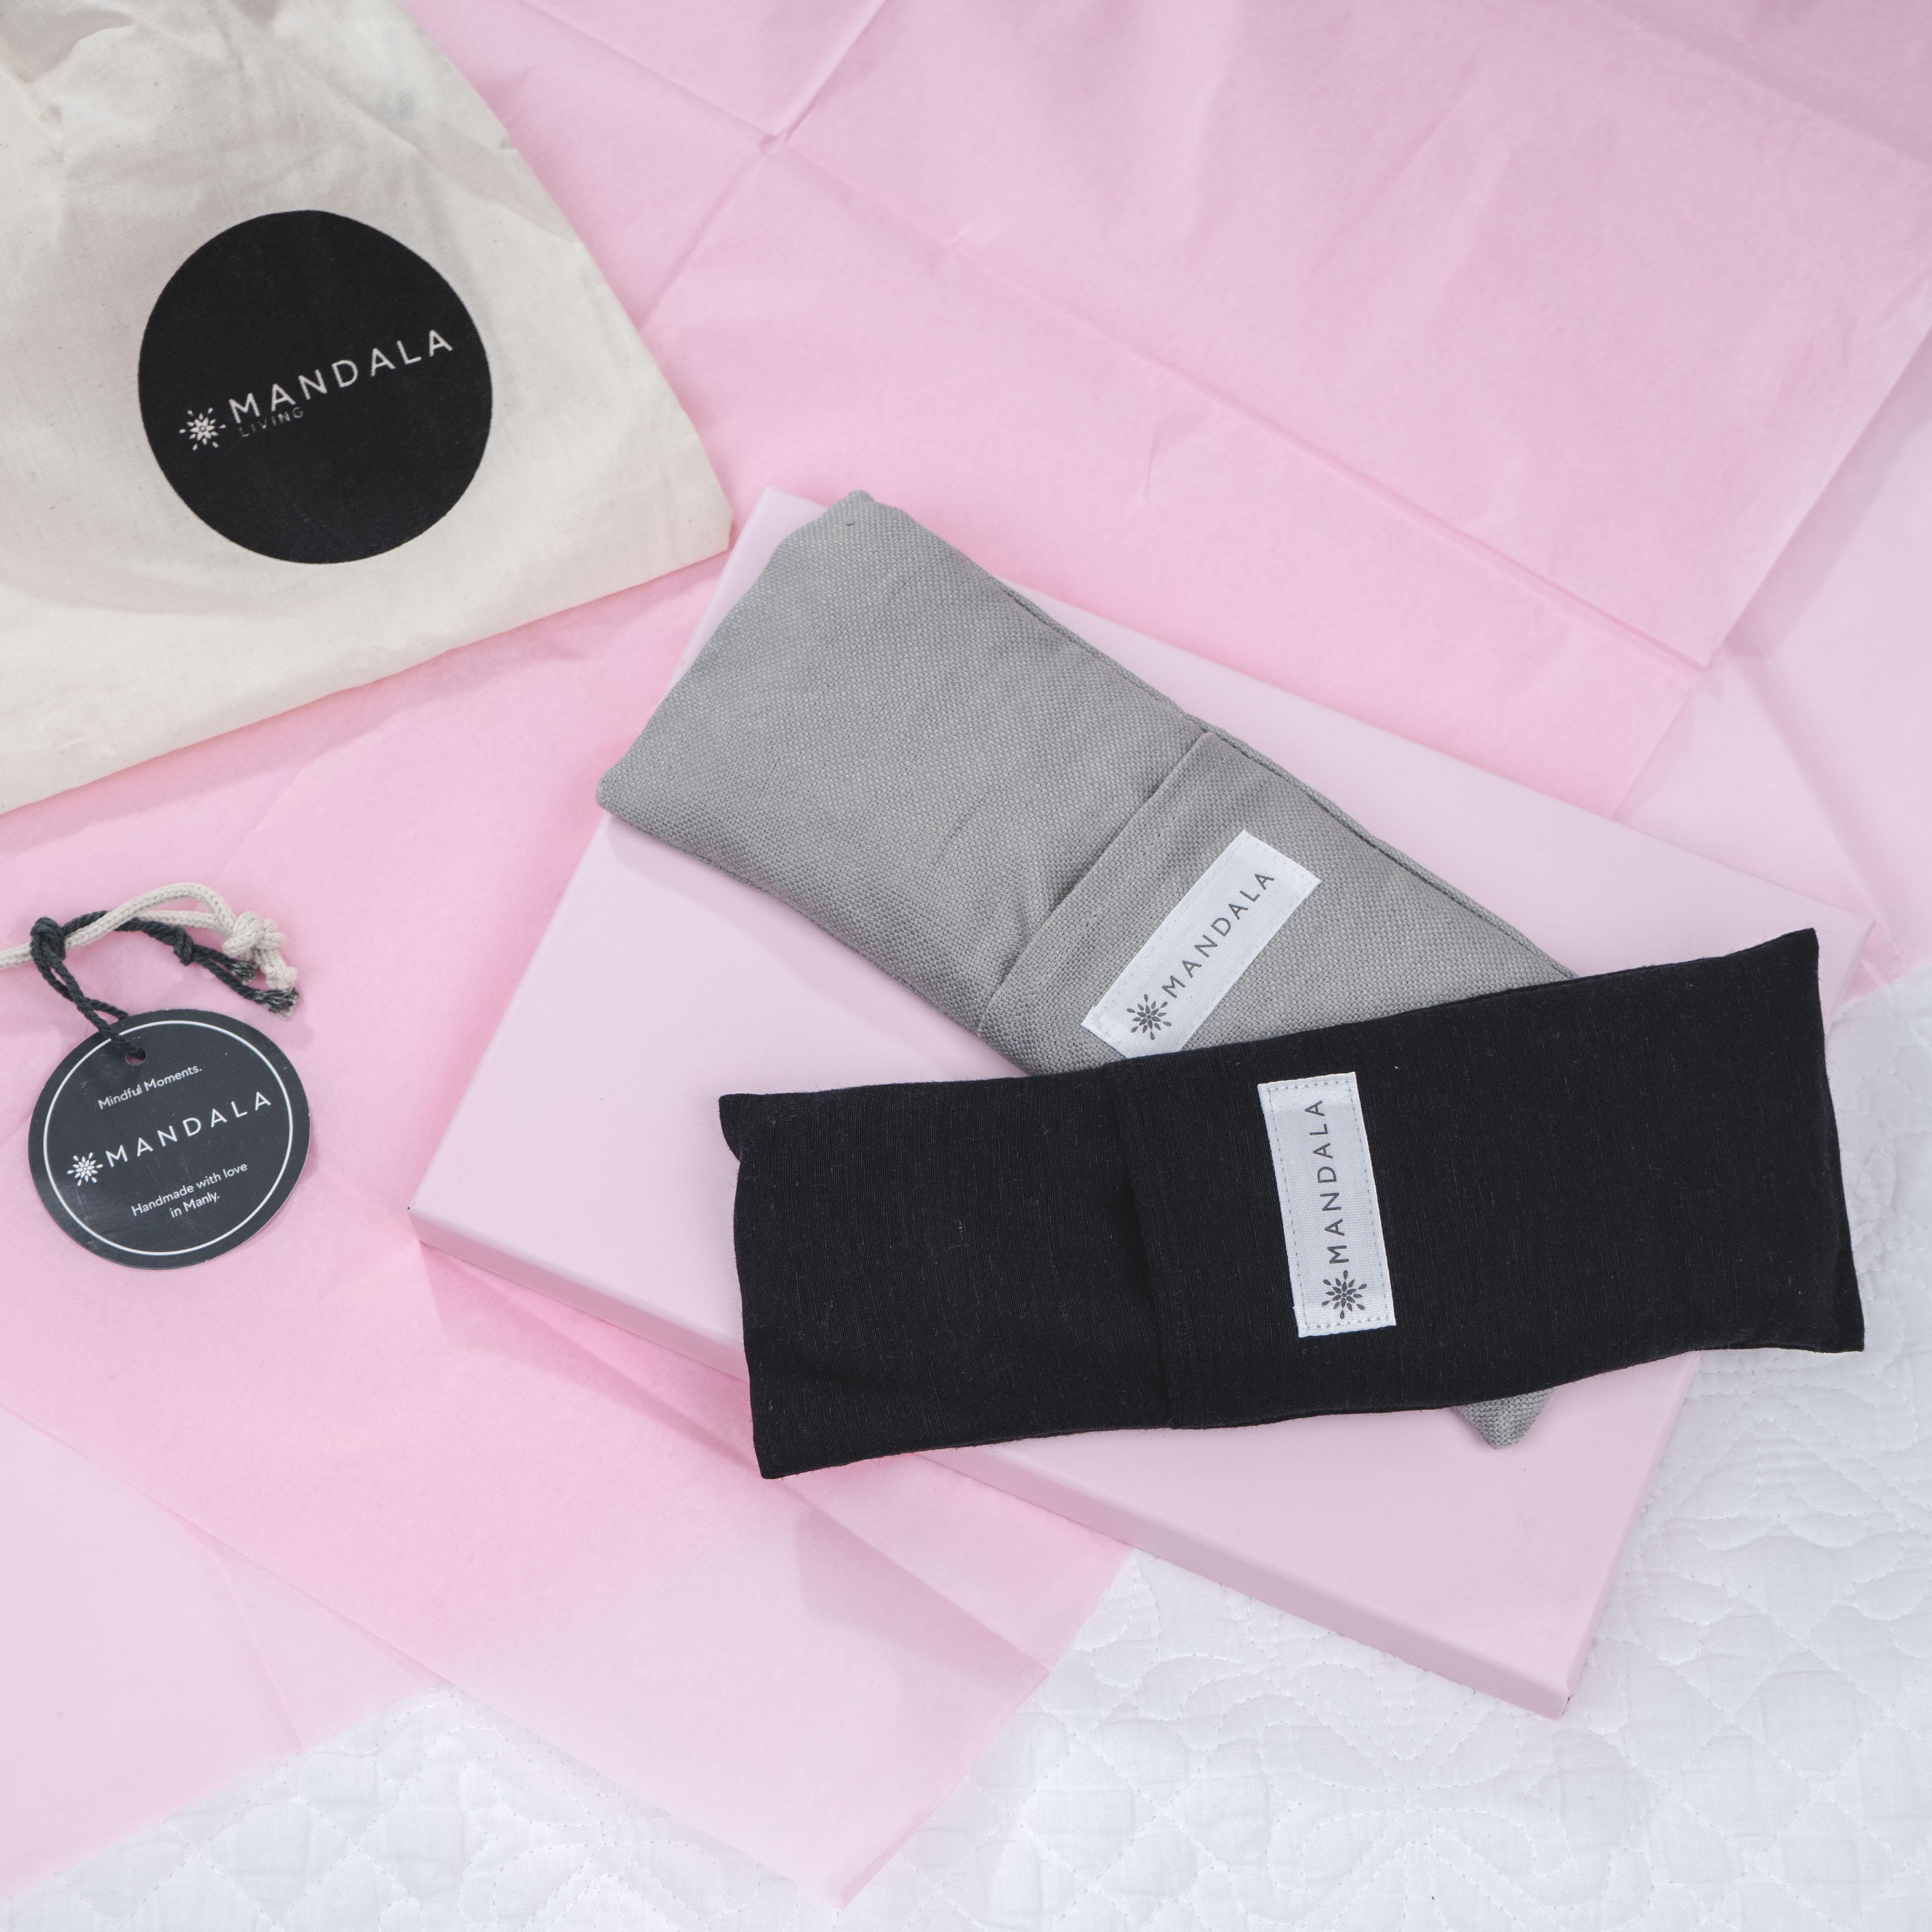 the-fashion-heist-australia-post-vegan-mothers-day-gift-guide-mandala-the-om-shop-reviver-eye-meditation-pillow-0907